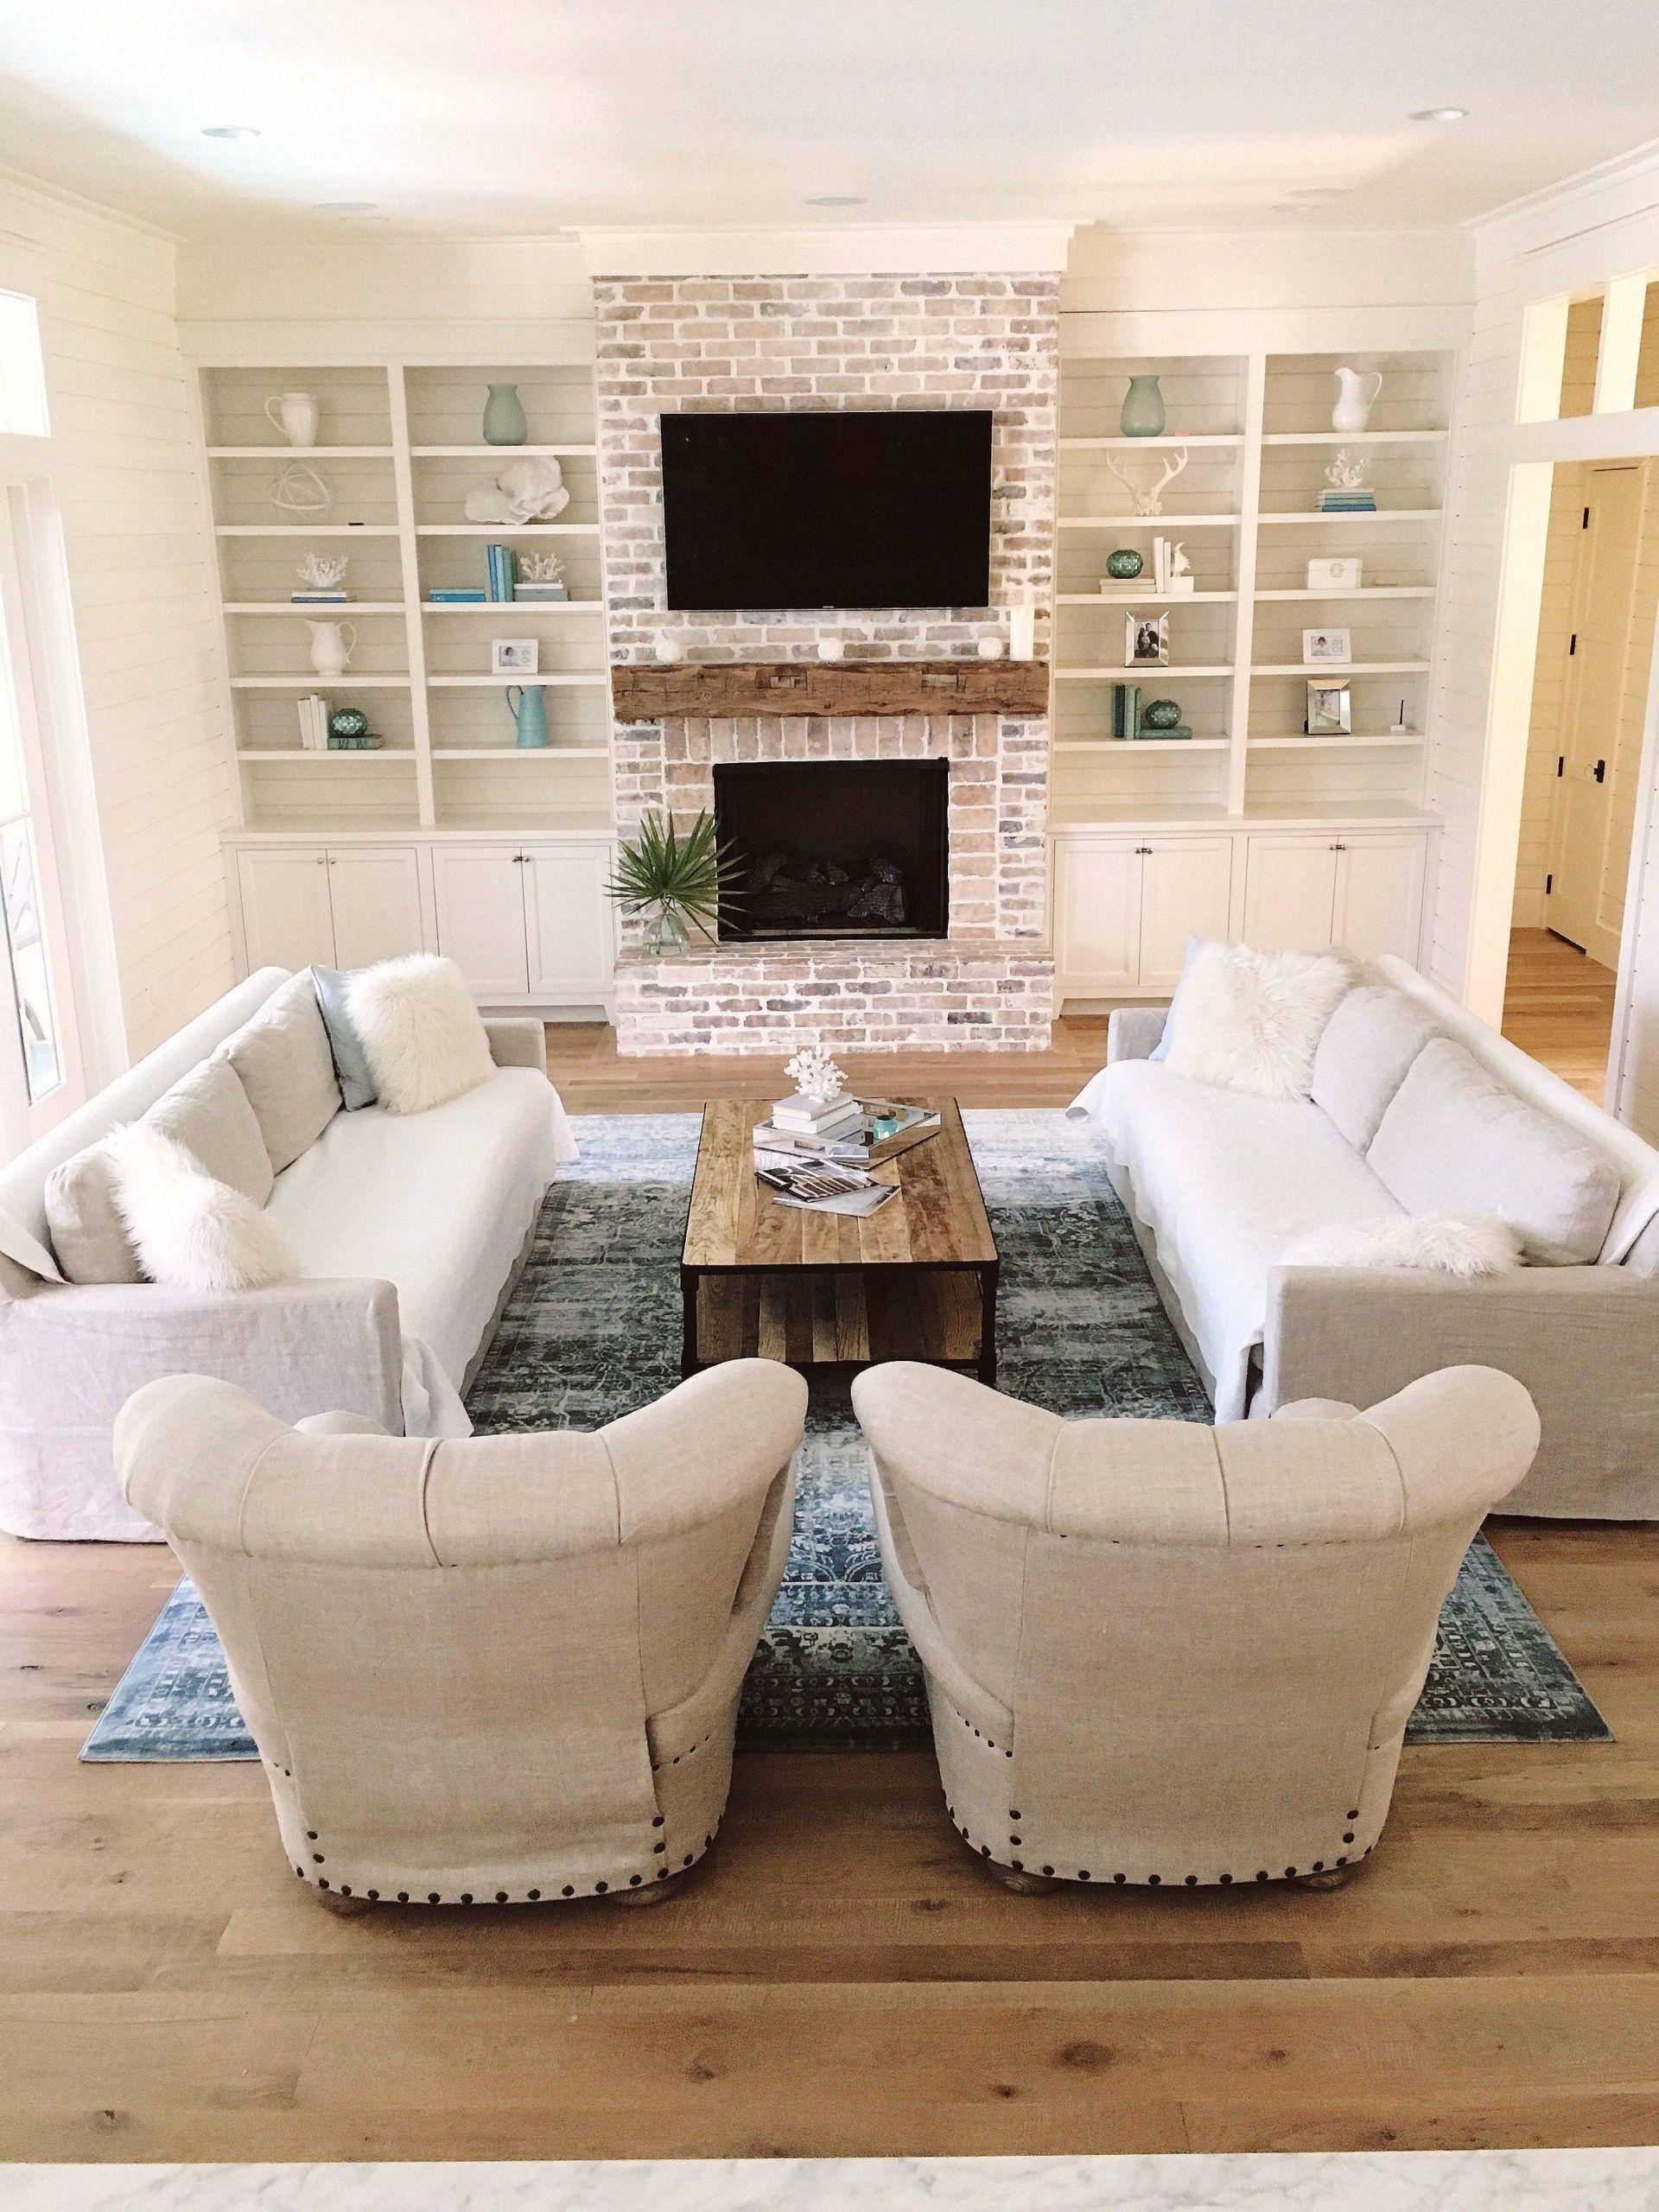 classic interior home design photos modern vintage living room ideas unique modern living room furniture new gunstige sofa macys furniture 0d